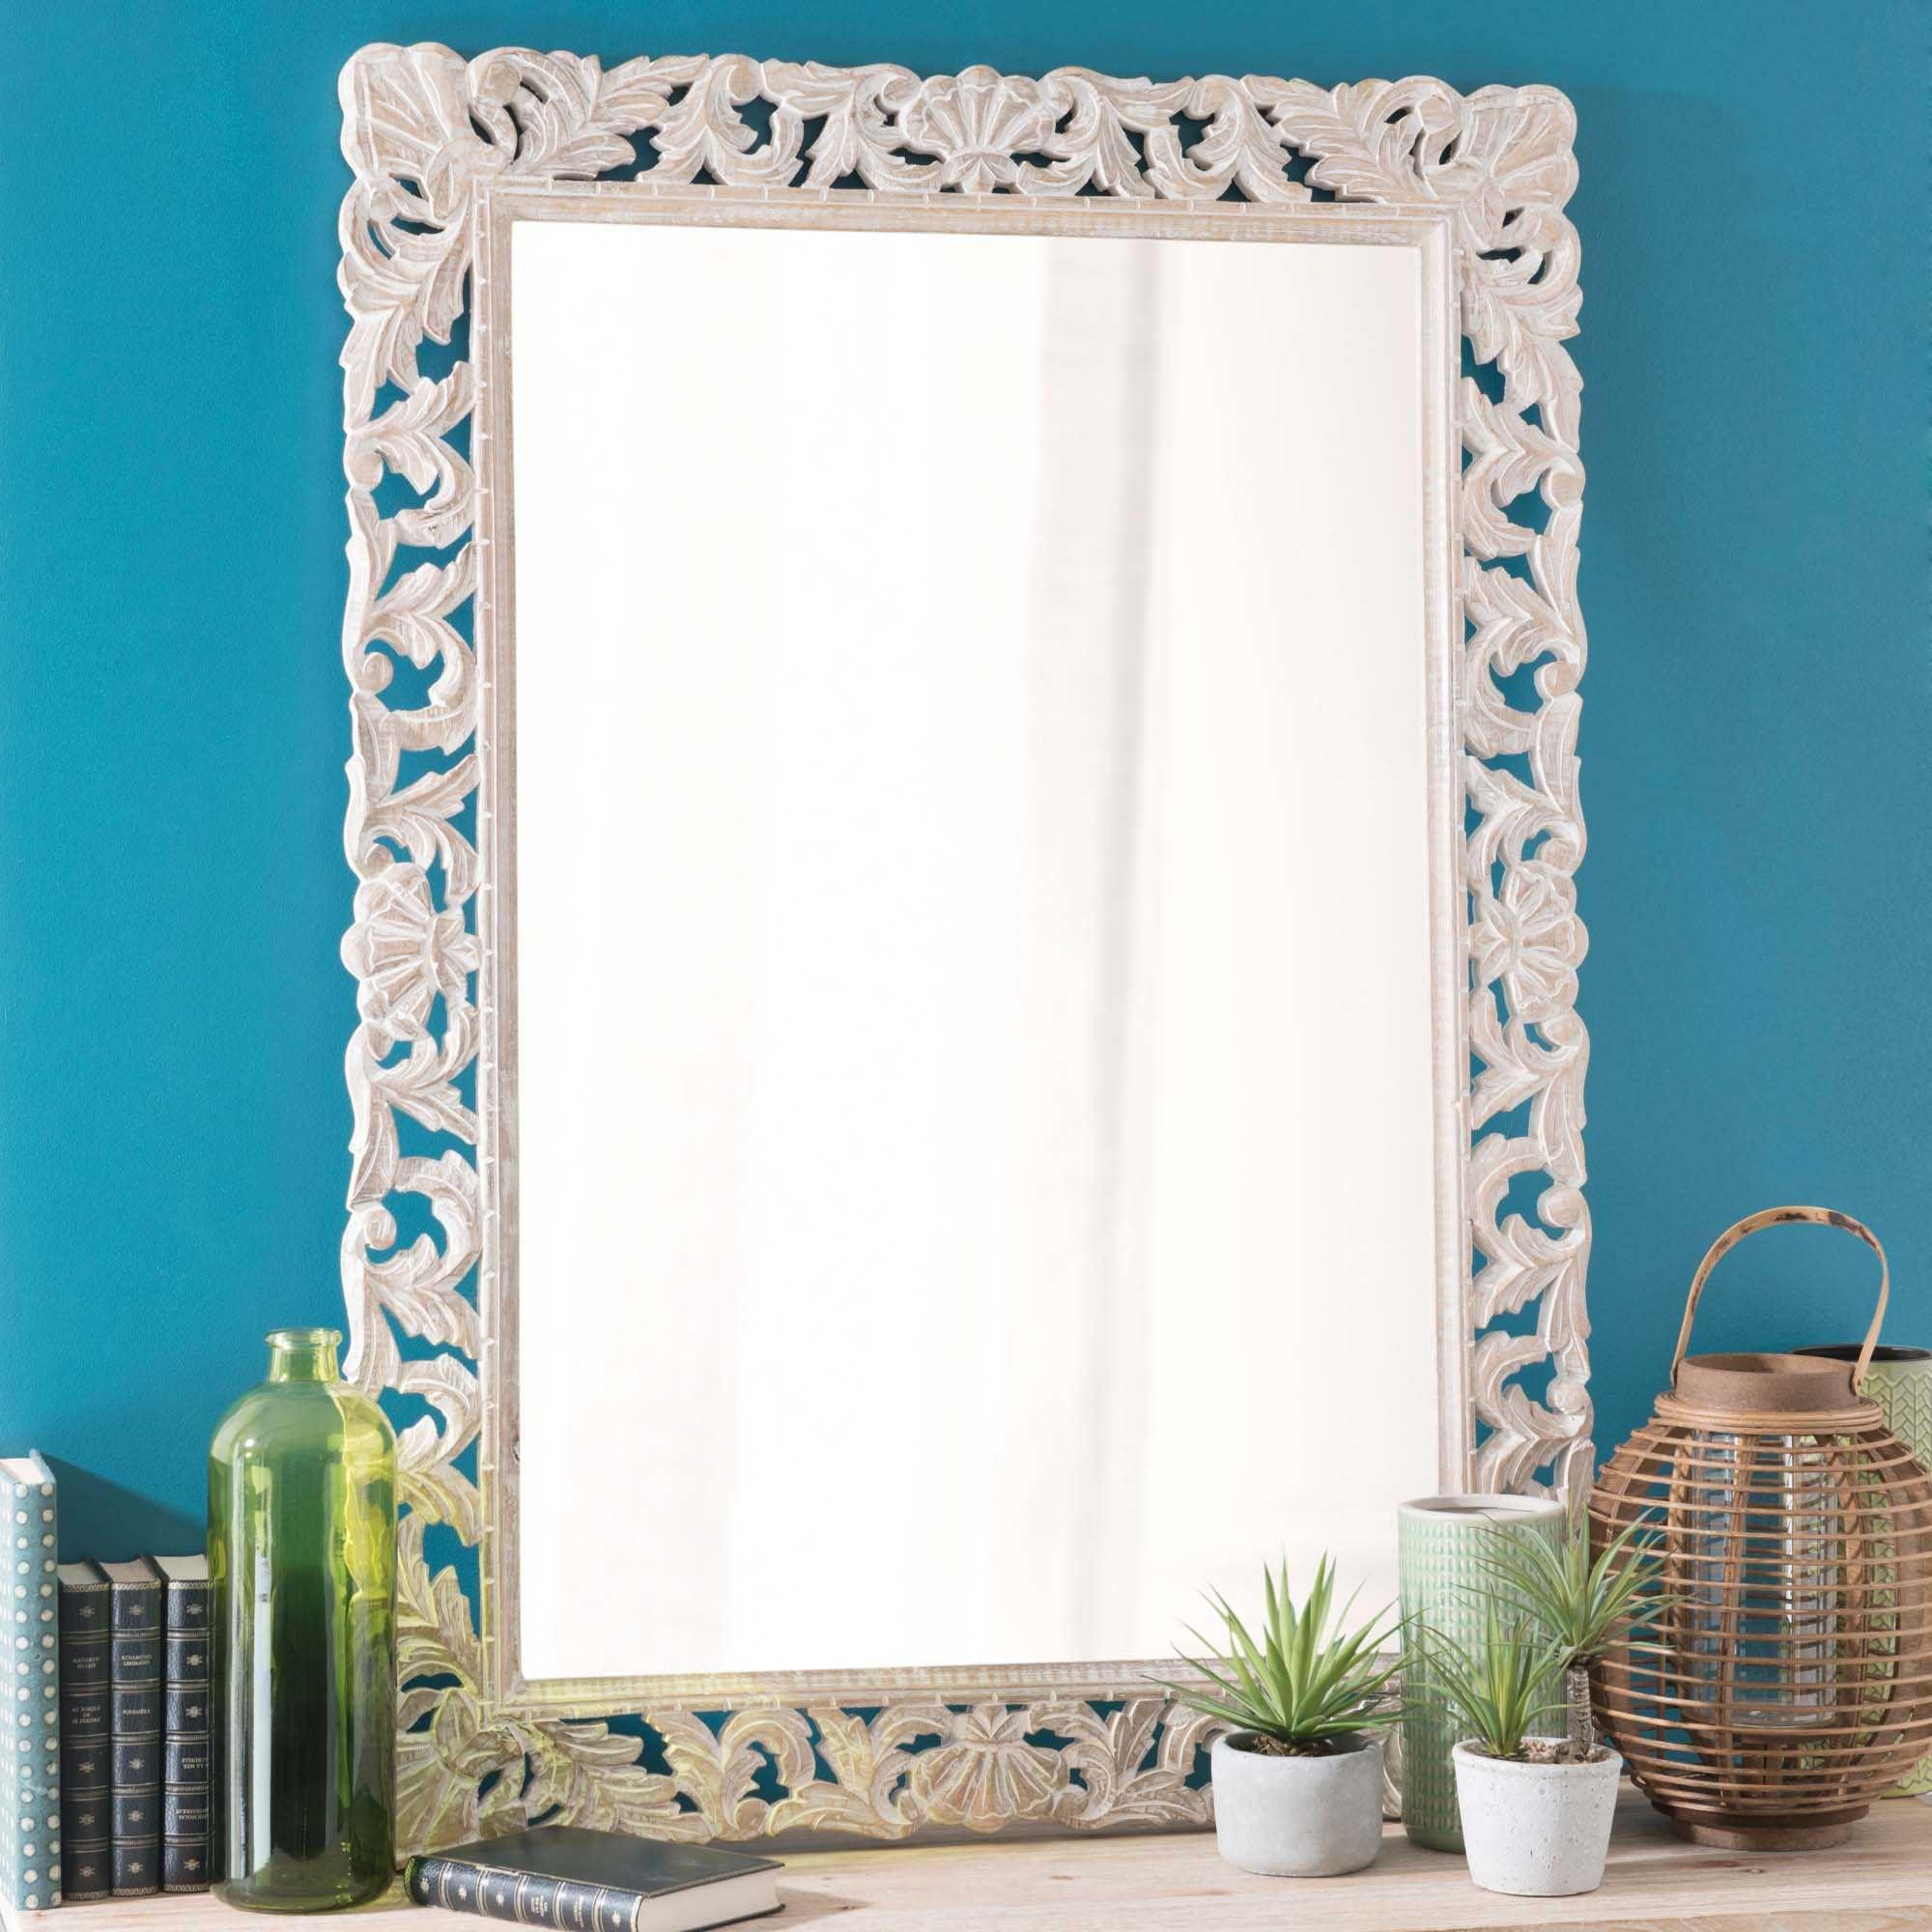 miroir en manguier blanchi 79x110 salle de bain wood mirror mirror et mango. Black Bedroom Furniture Sets. Home Design Ideas